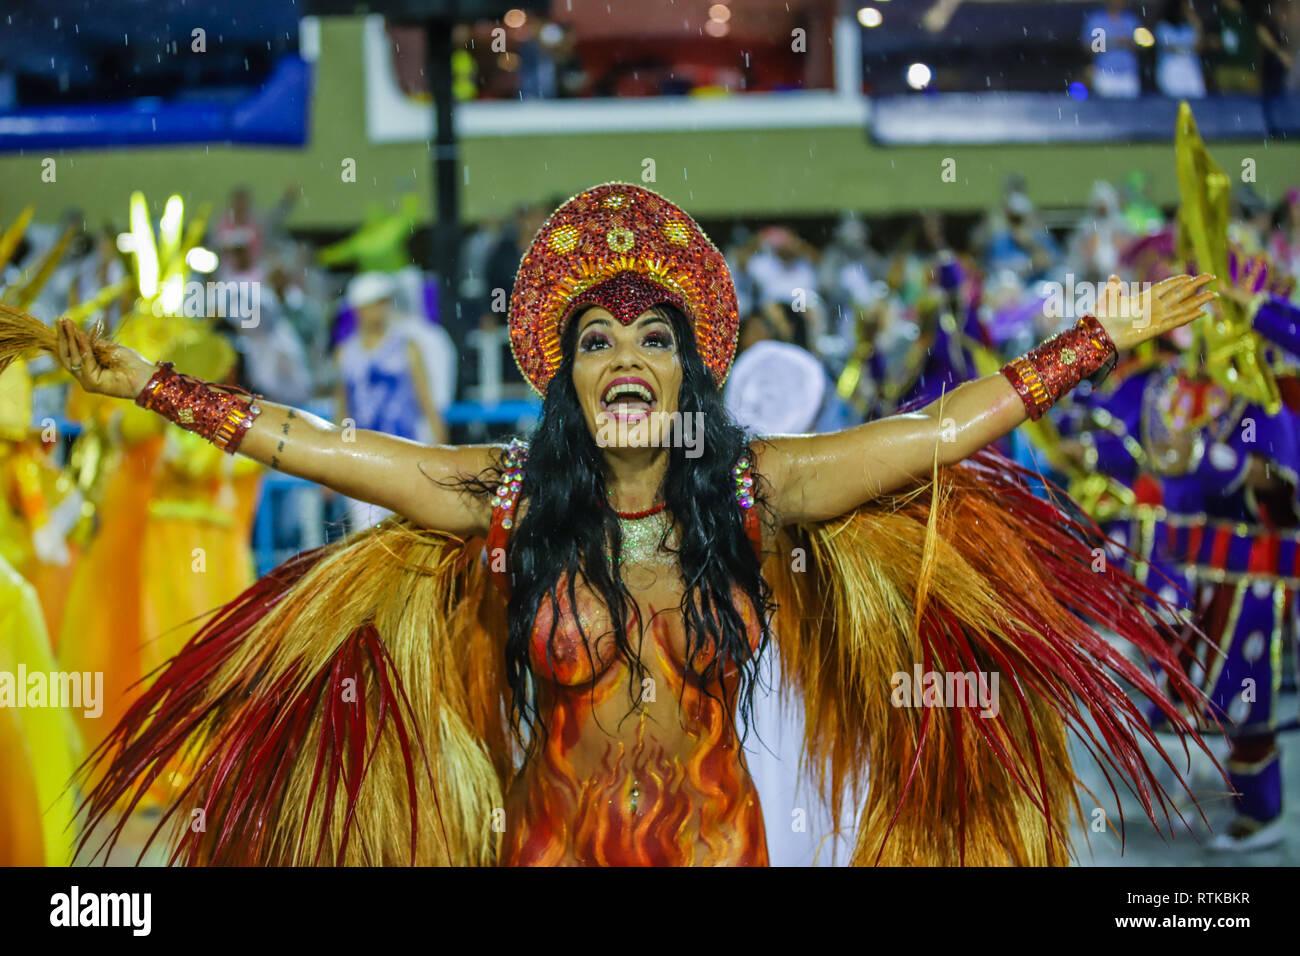 FuГџball Wm 2020 Brasilien